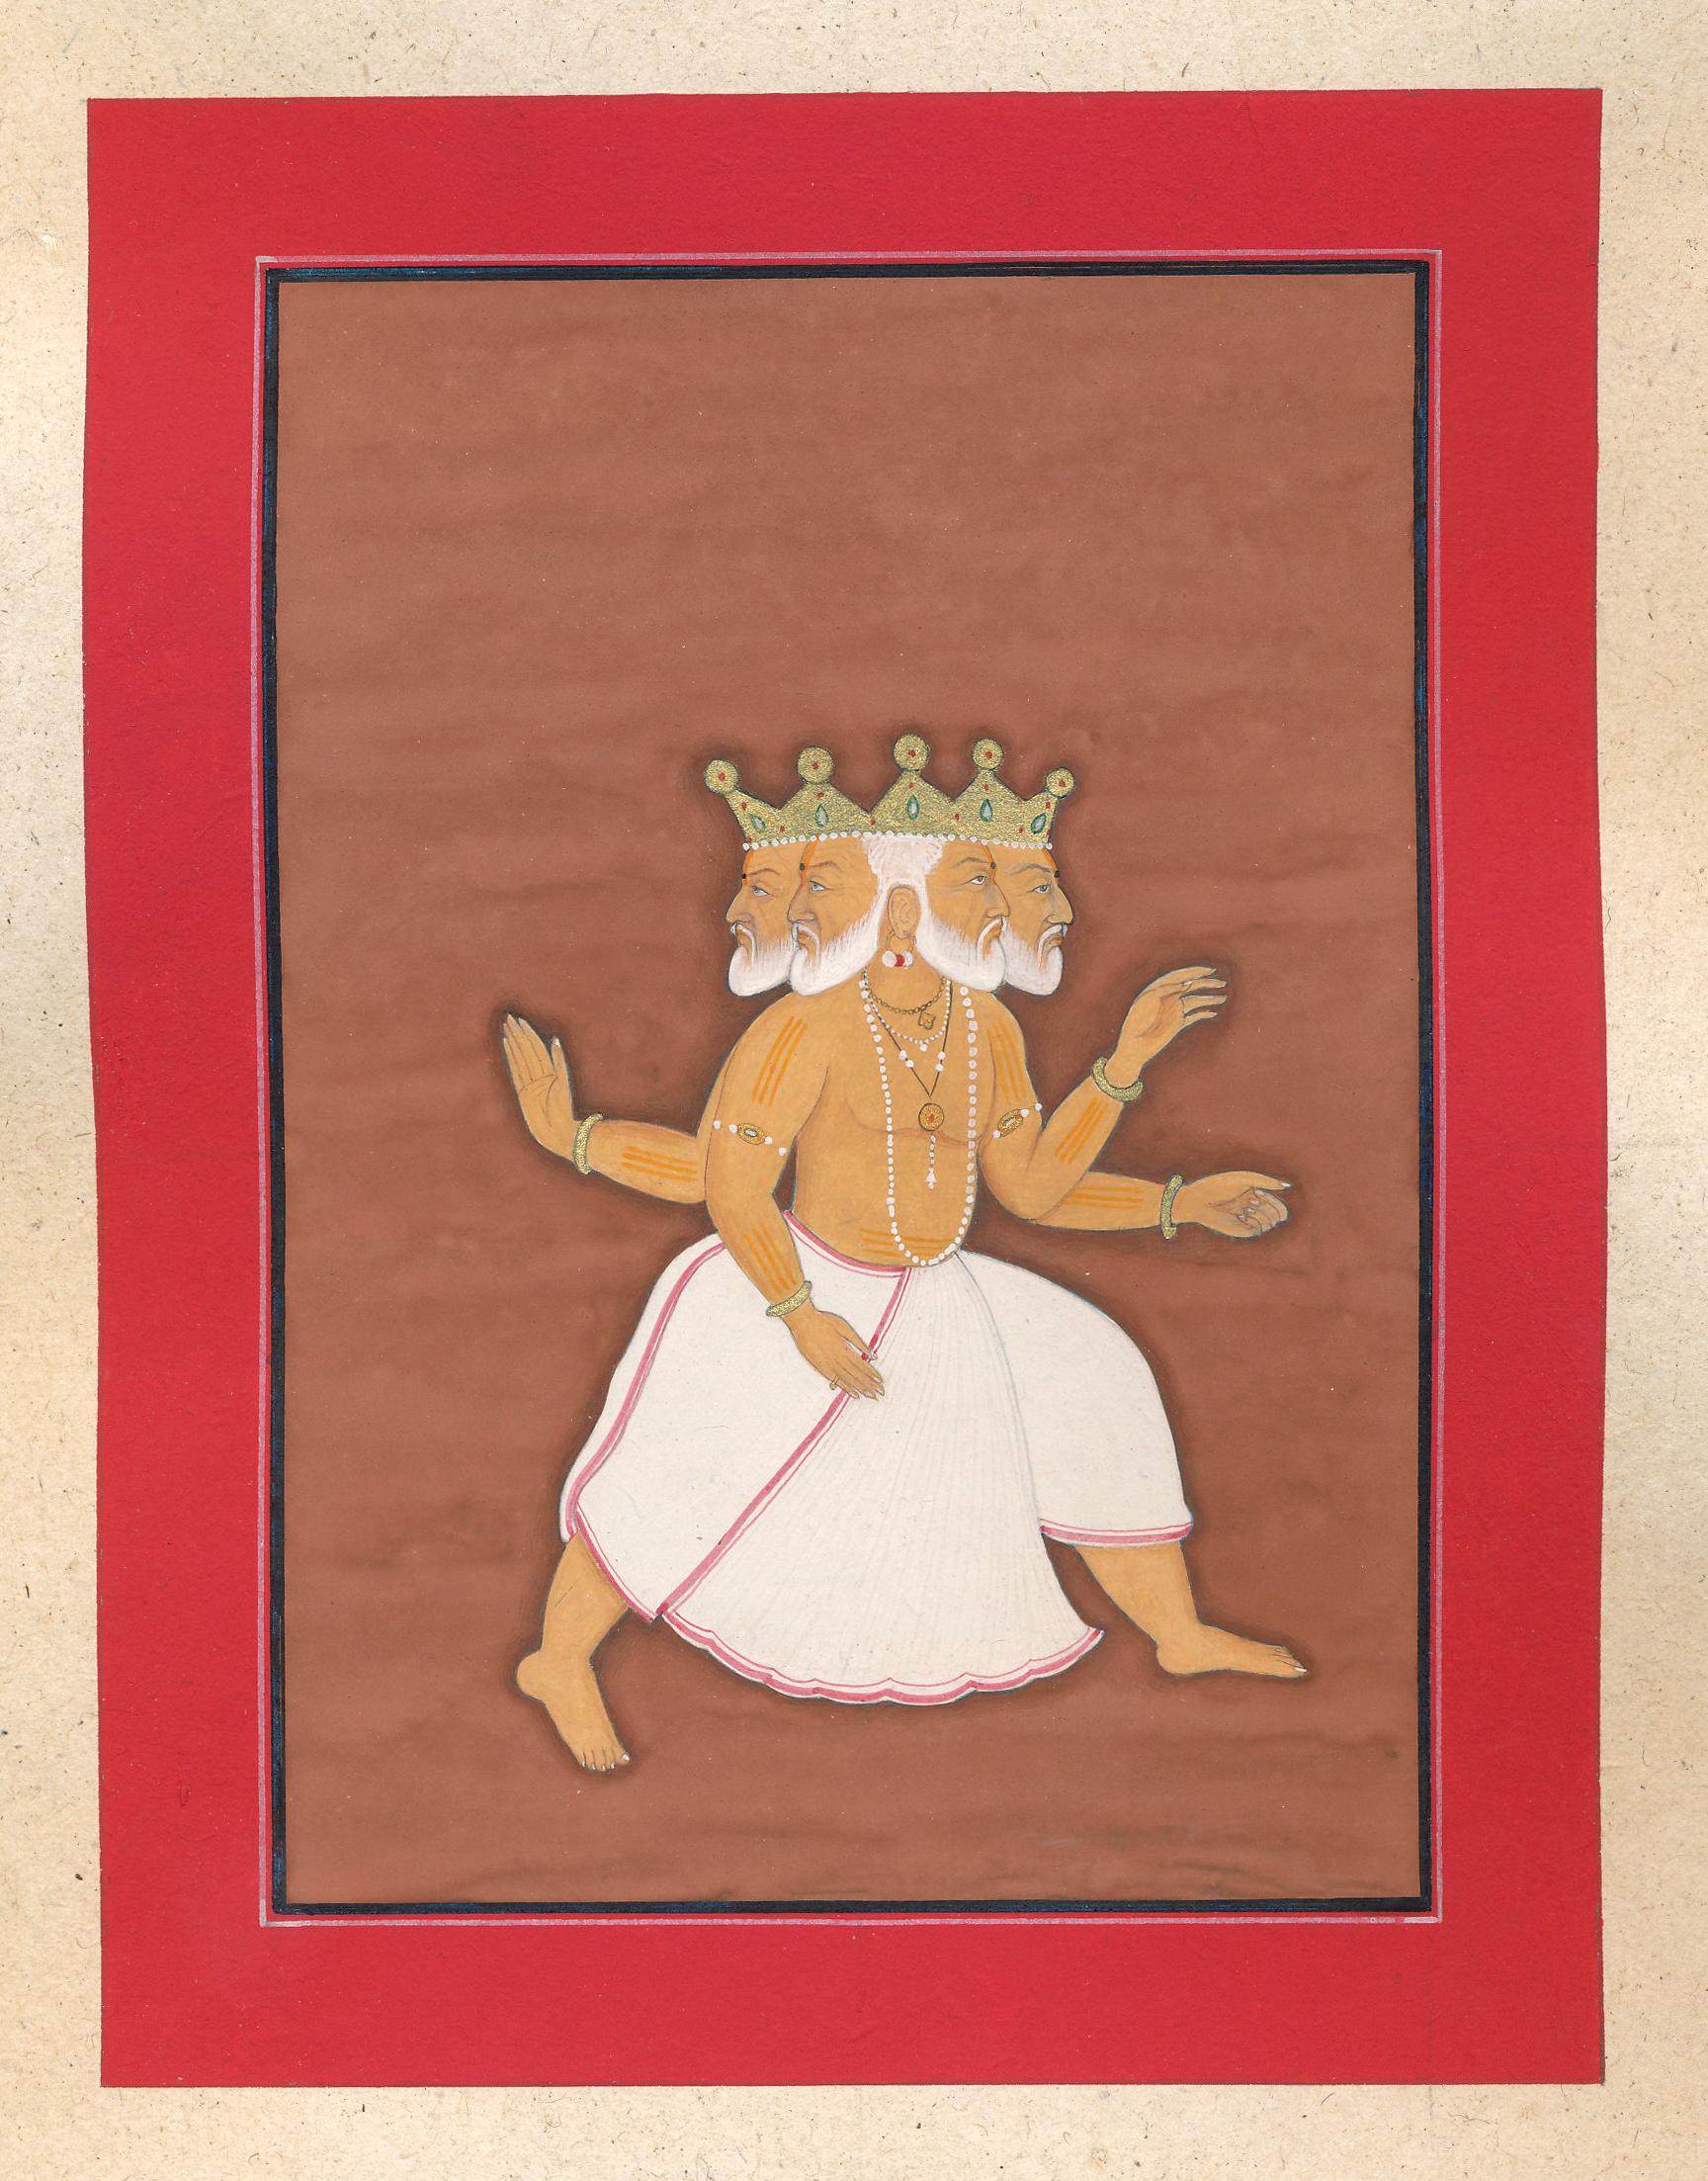 Mumtaz's depiction of the Hindu god Brahma, the four-headed god of creation